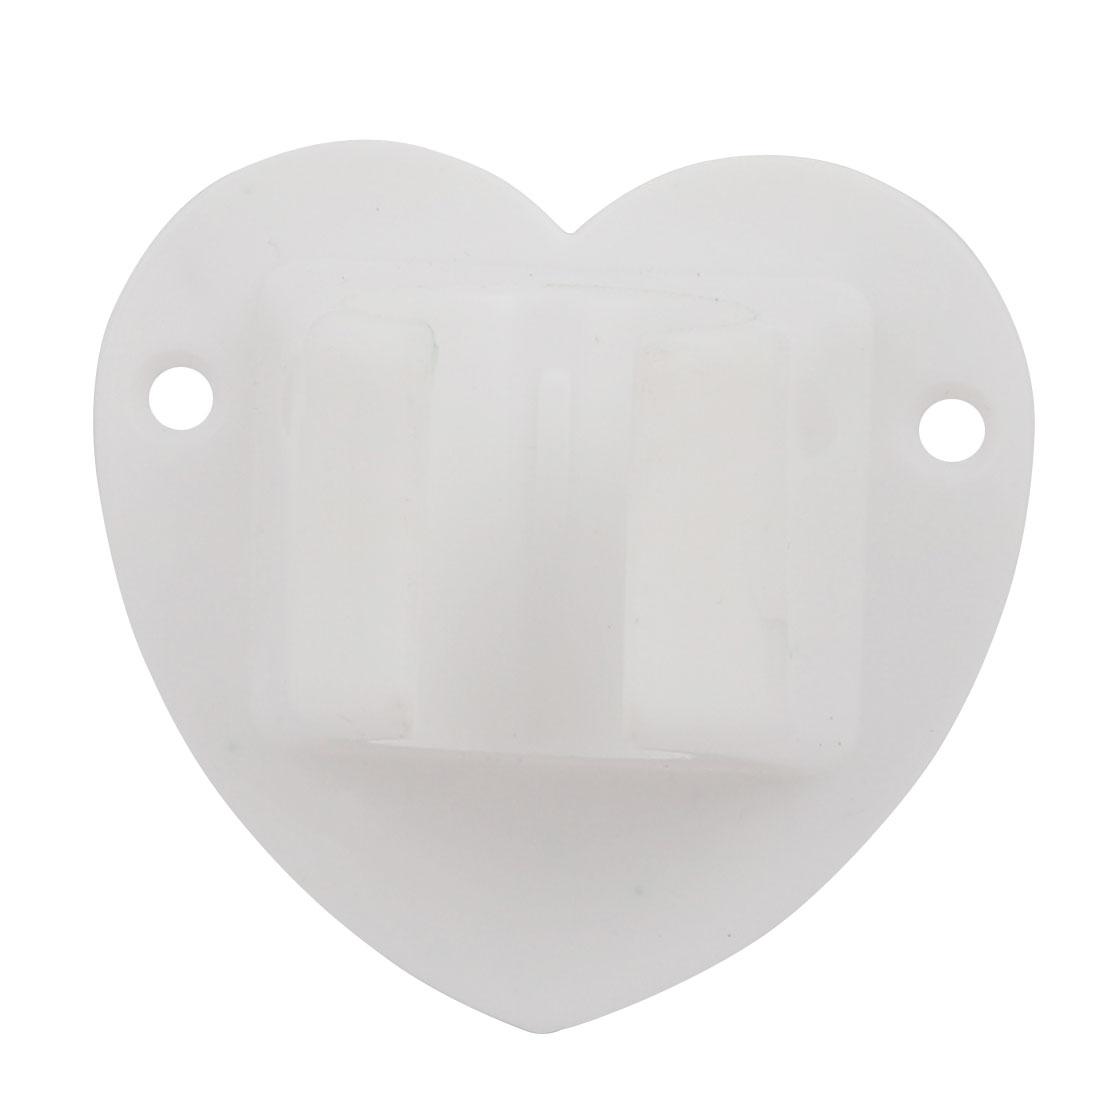 Bathroom Shower Accessory Plastic Wall Mount Bracket White w Screws